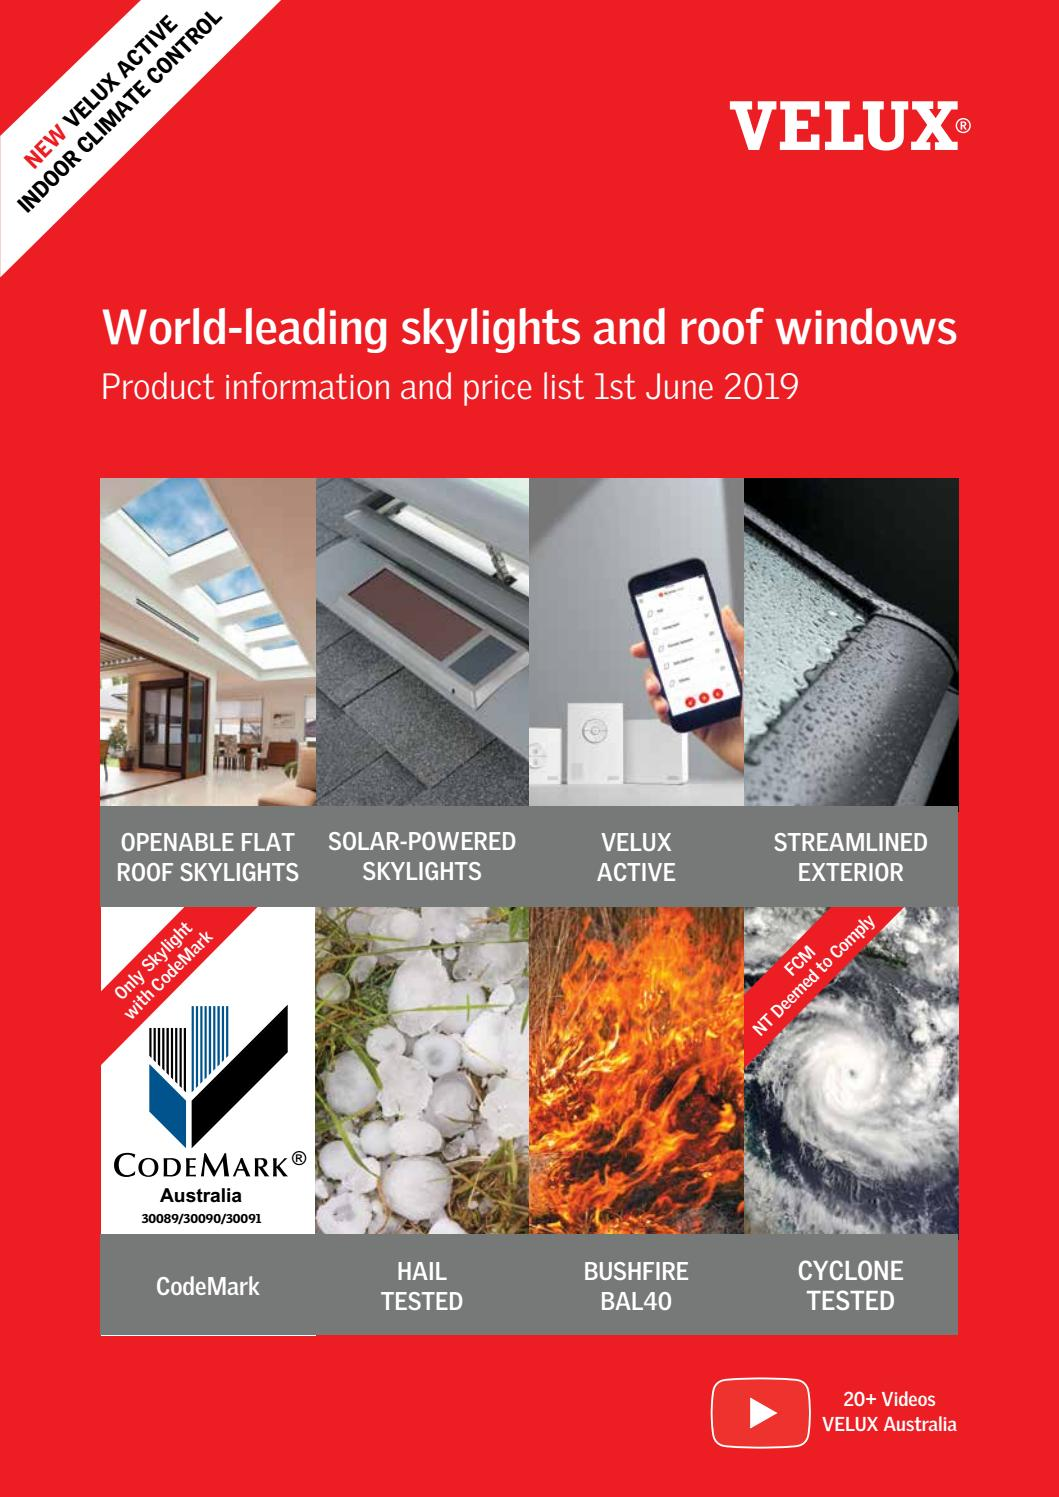 Velux SHORT SKYLIGHT CONTROL ROD 60cm Aluminium Easy To Store